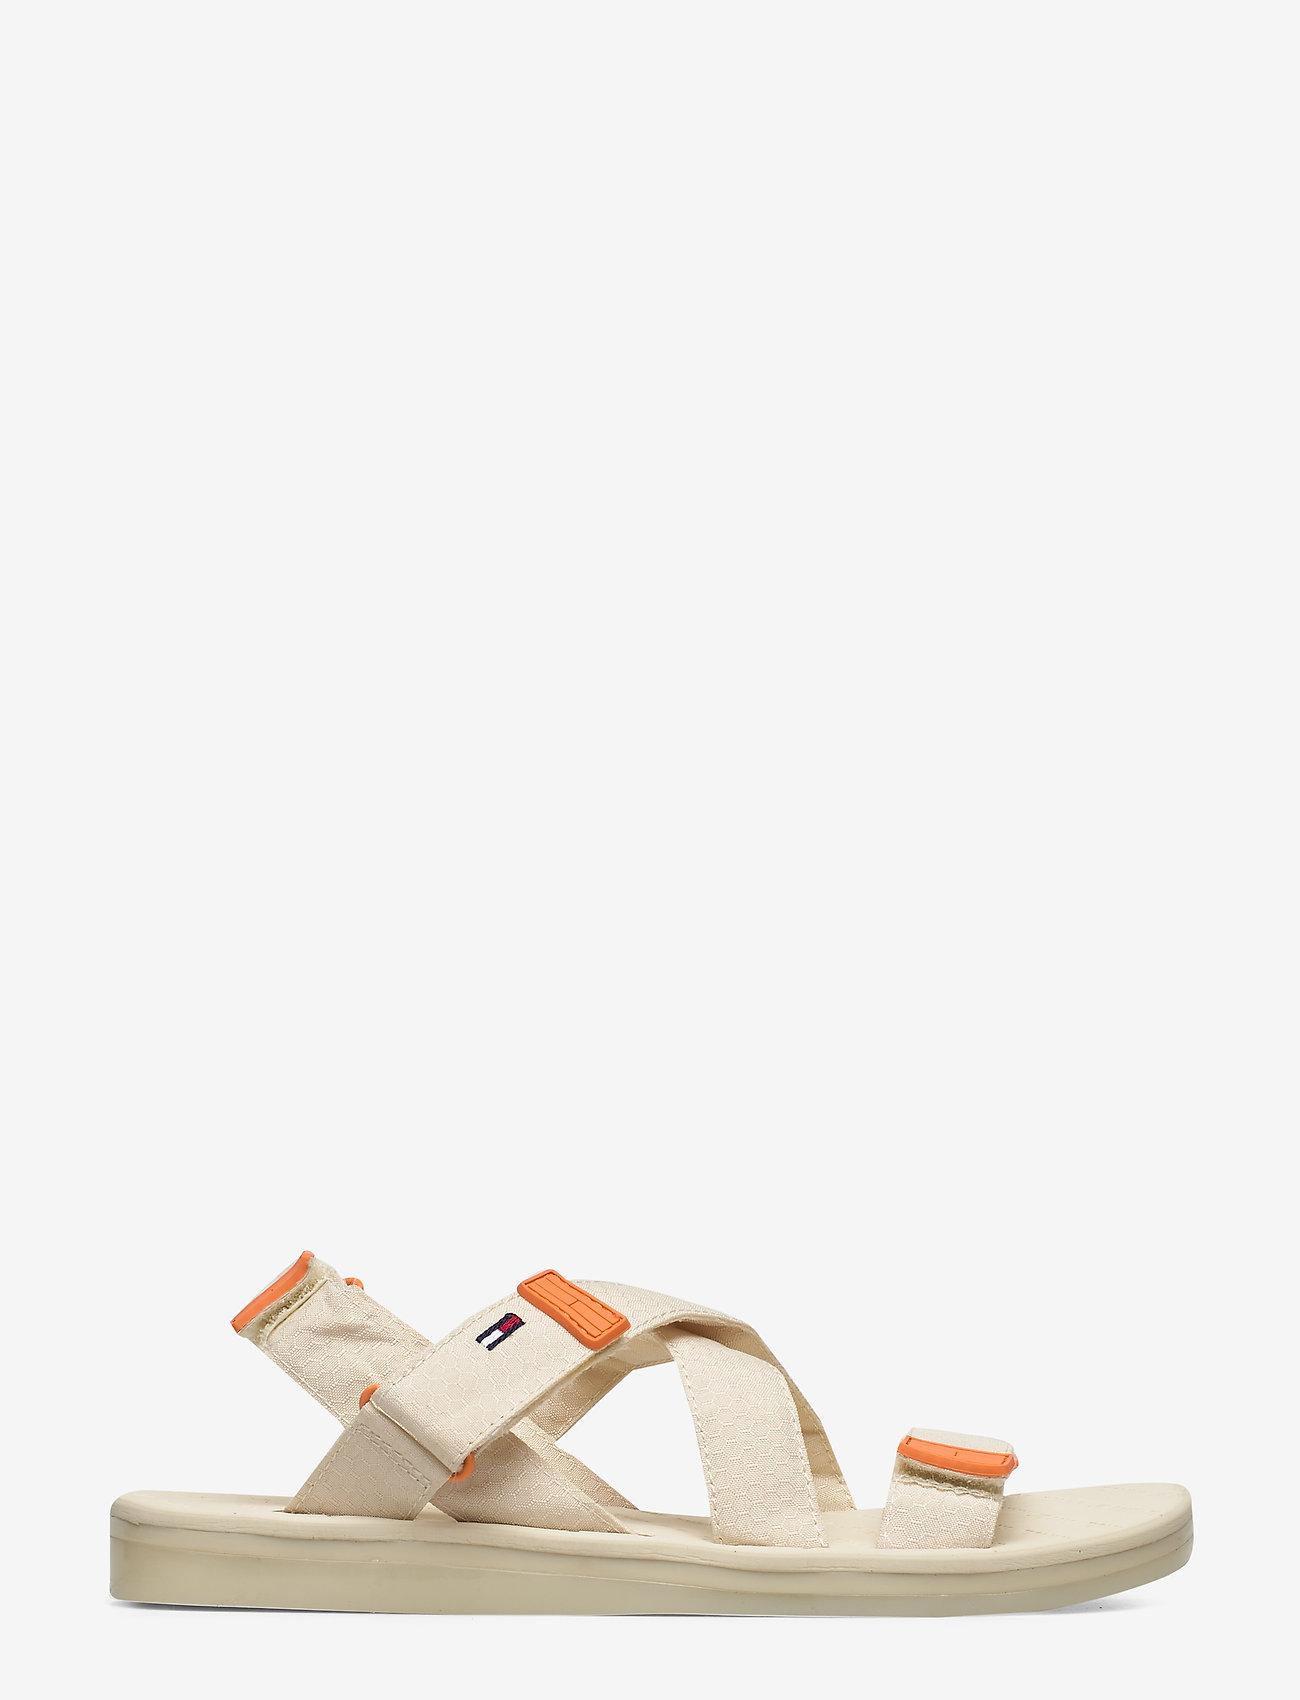 Tommy Hilfiger - TOMMY SURPLUS FLAT SANDAL - flat sandals - light silt - 1